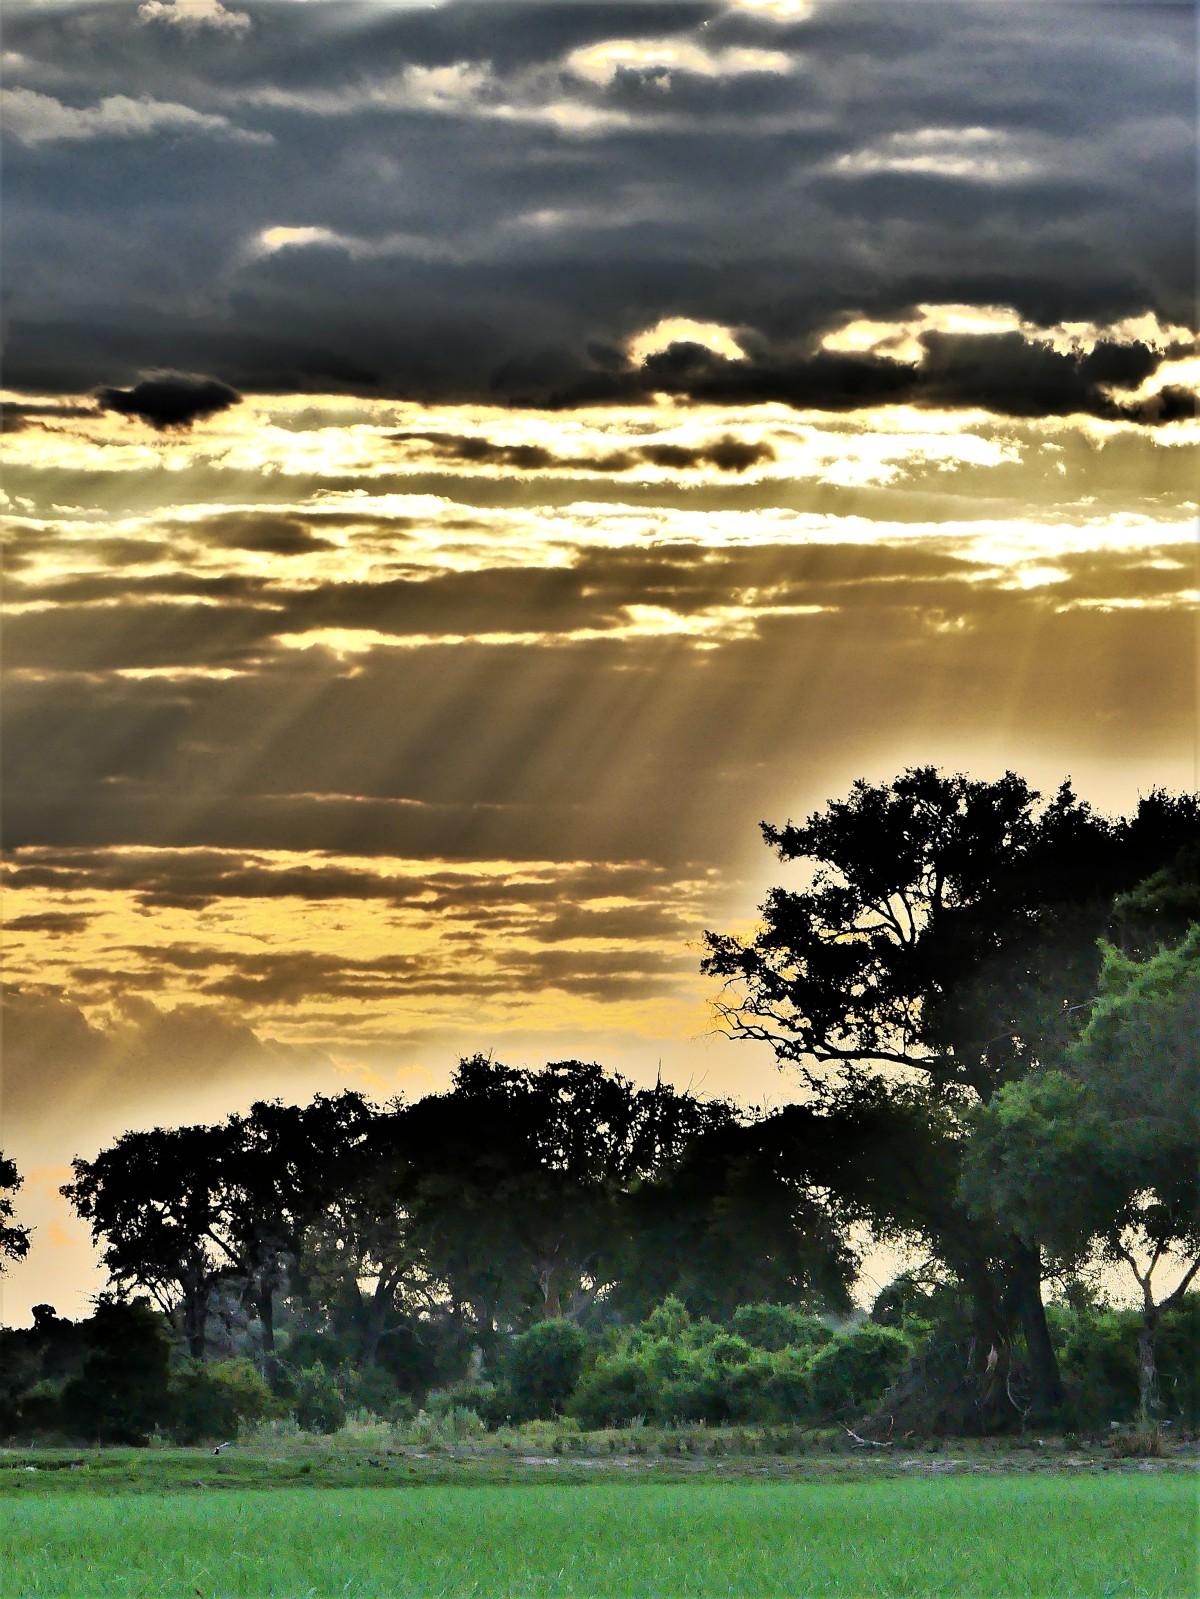 Sunset on the Okavango River